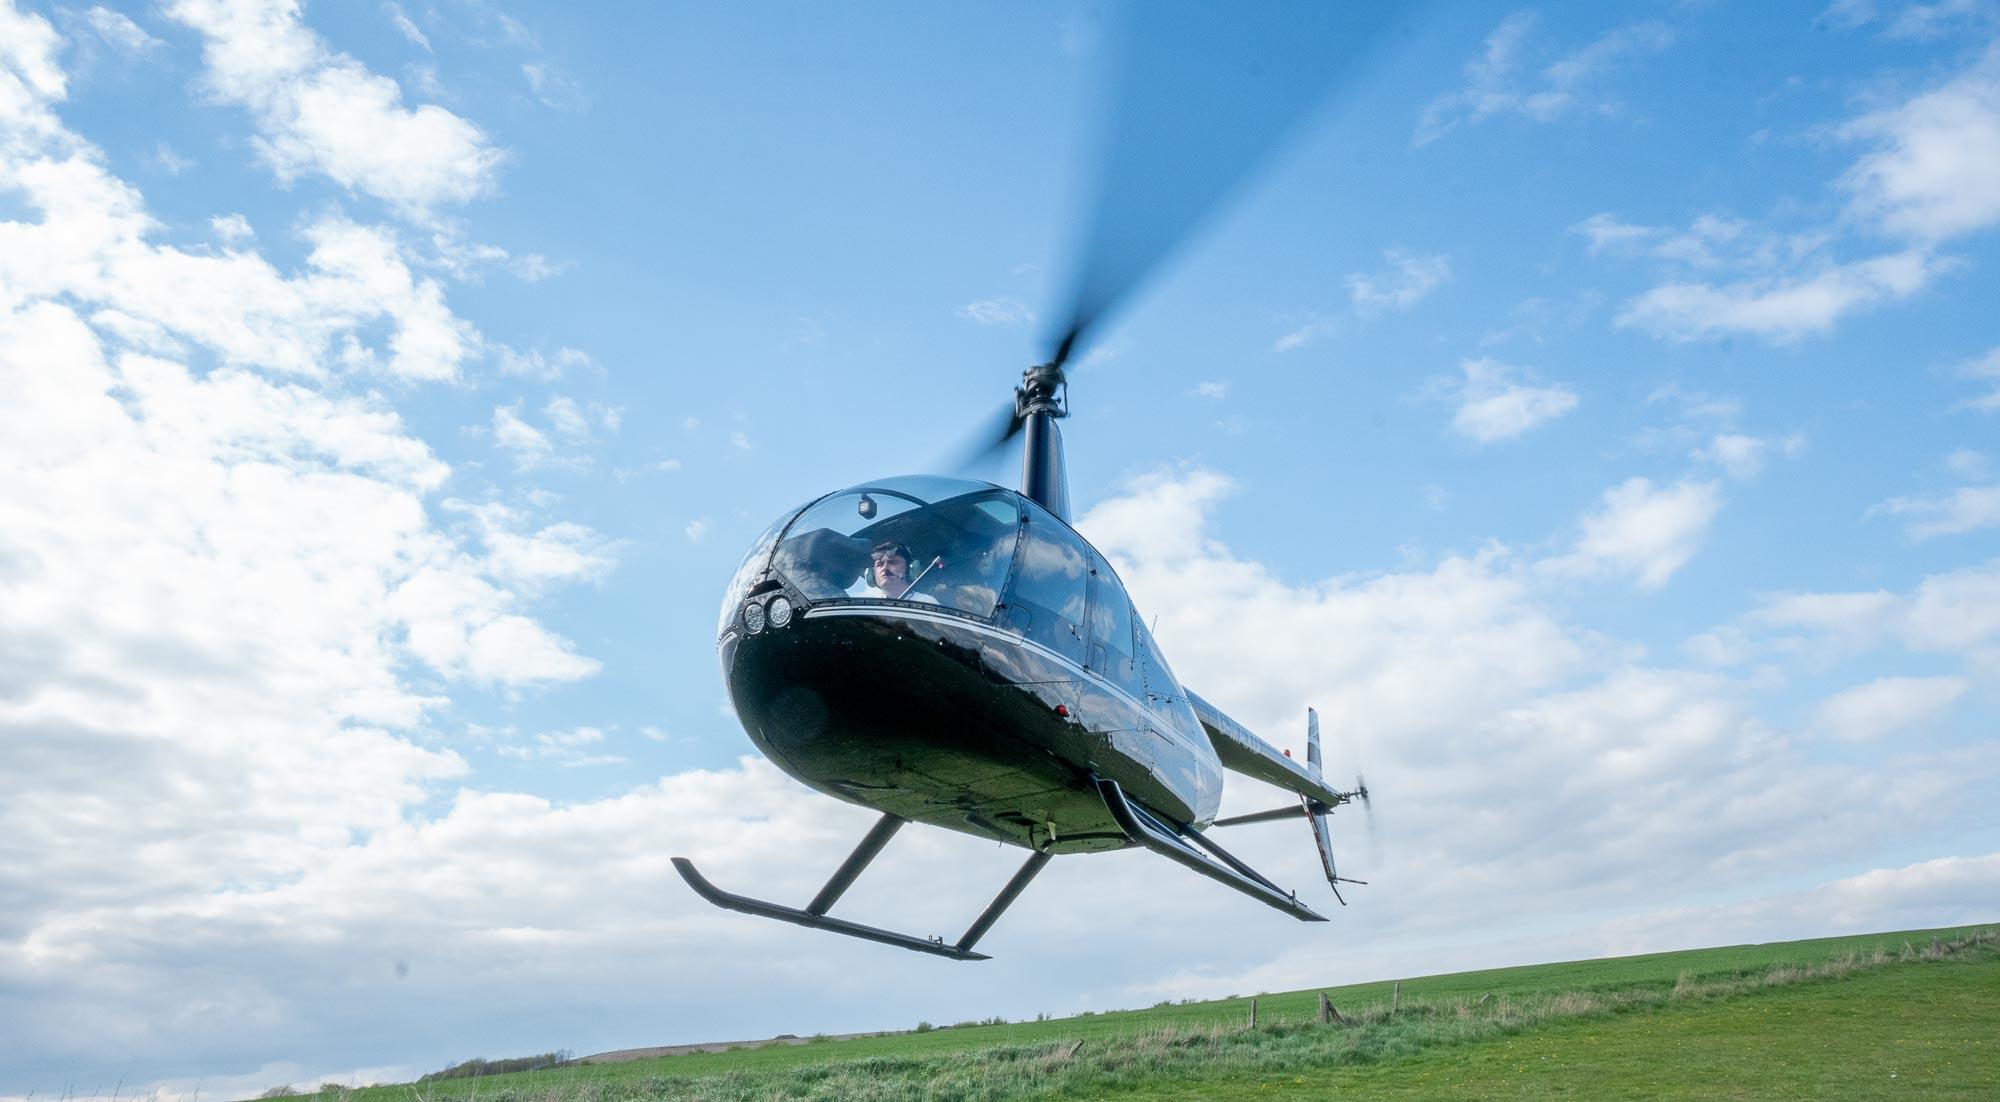 Helicopter Autorotations